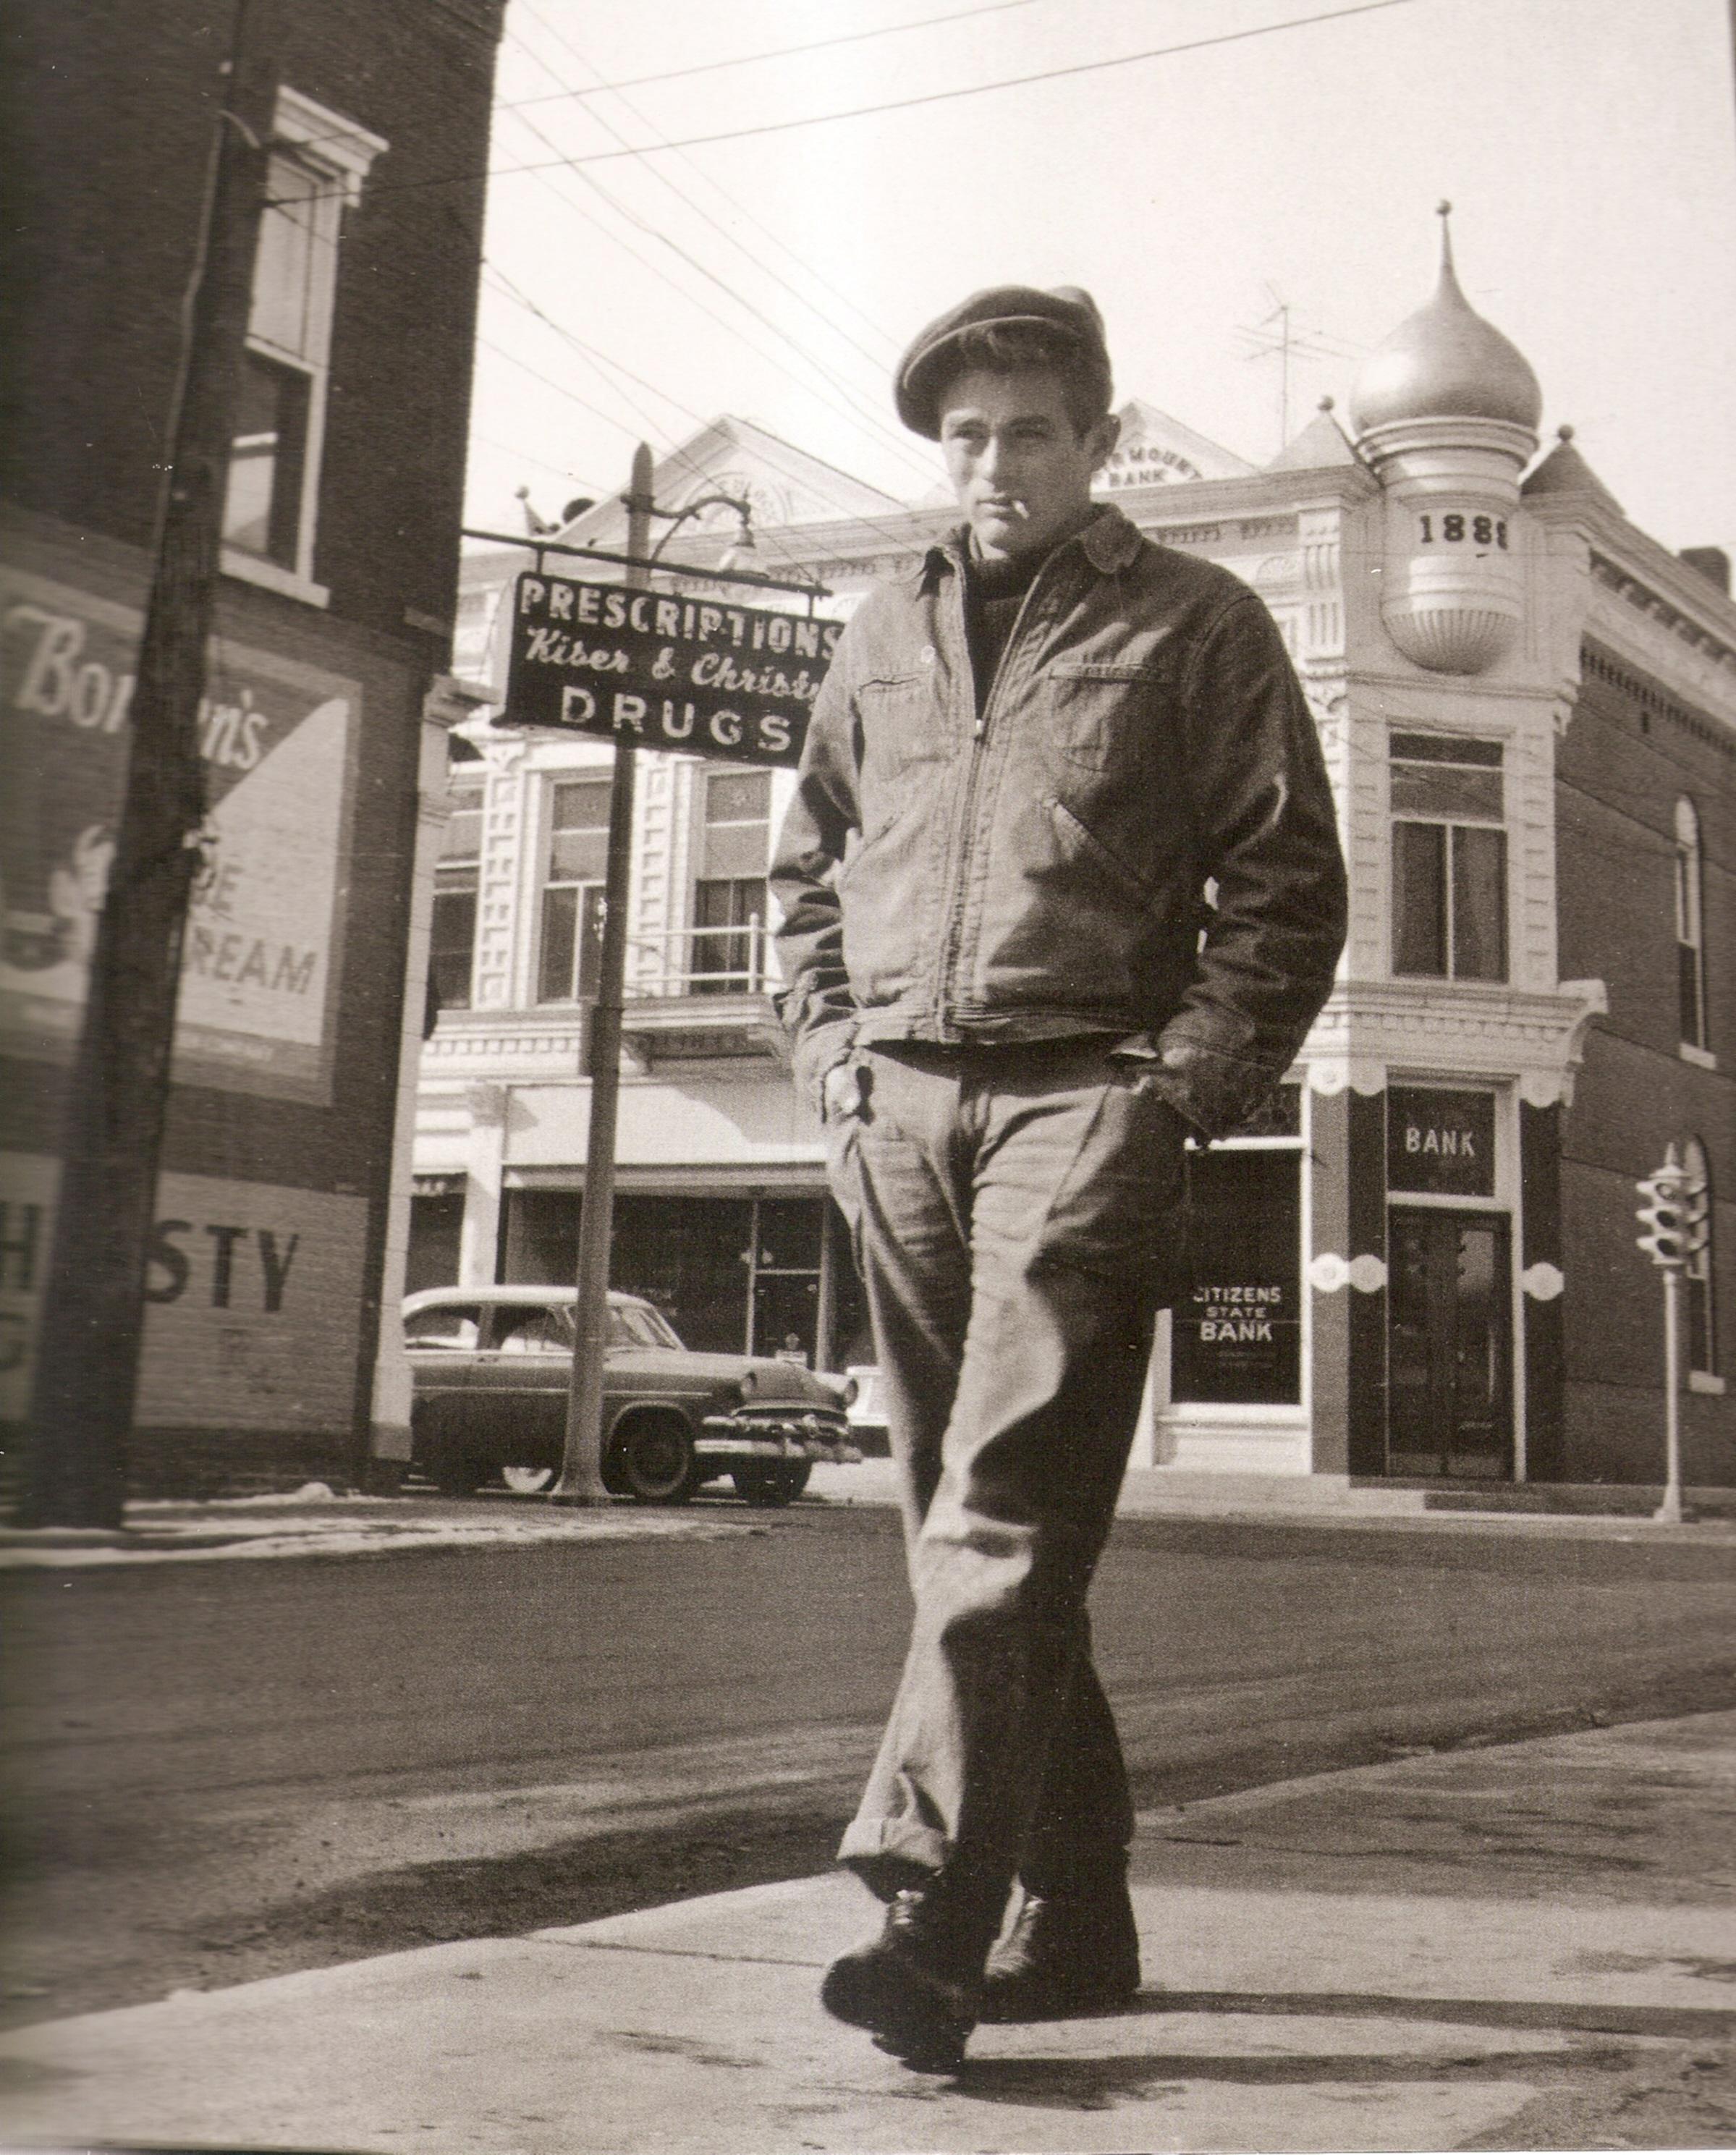 James Dean walking on Washington St. #3